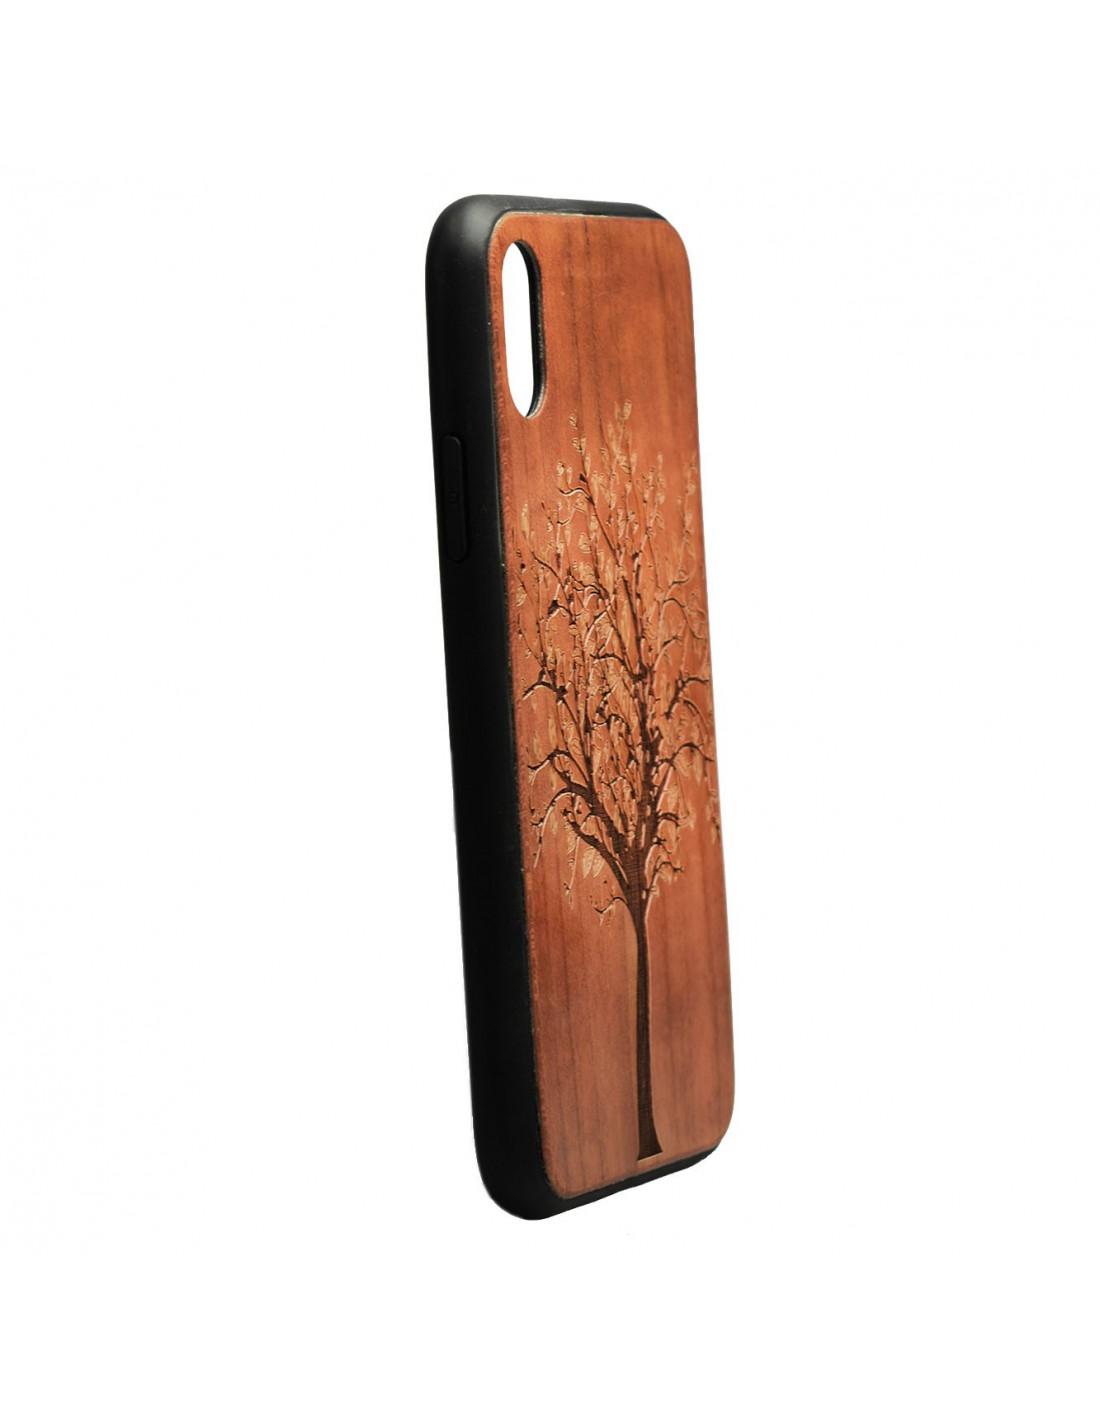 490433c04a4 Carcasa Madera Tallada Árbol para iPhone X